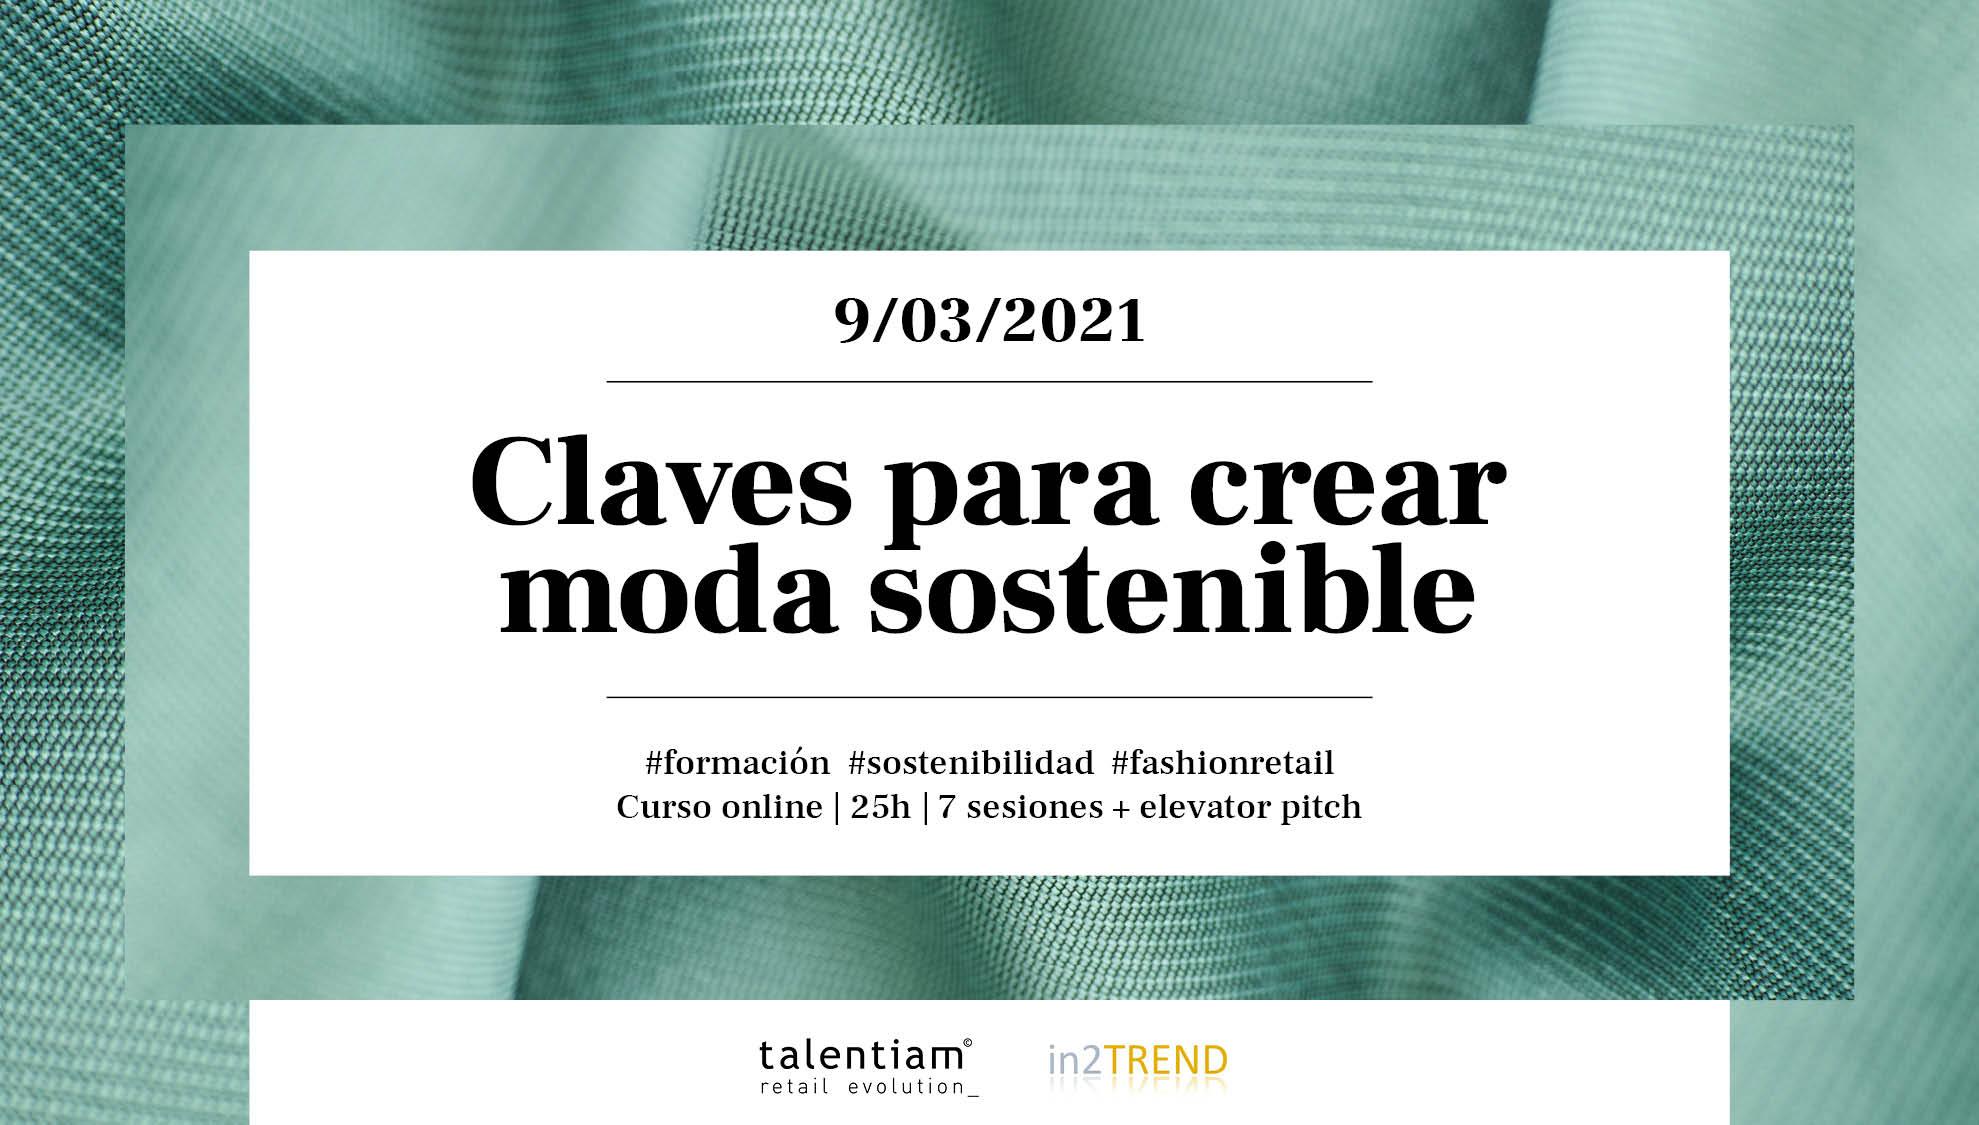 Claves para crear moda sostenible